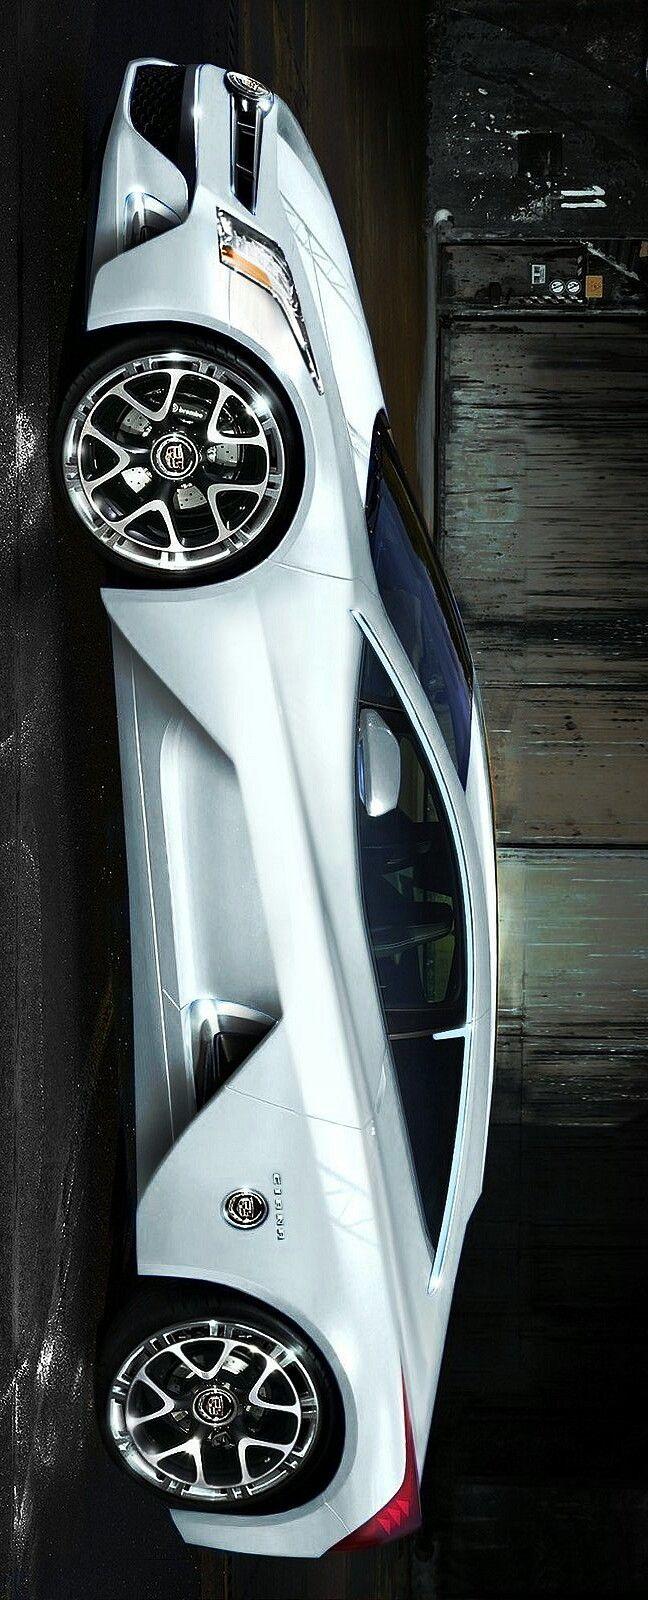 2020 21 Cadillac Ciana Will Be An Mid Engine Hybrid Luxurious